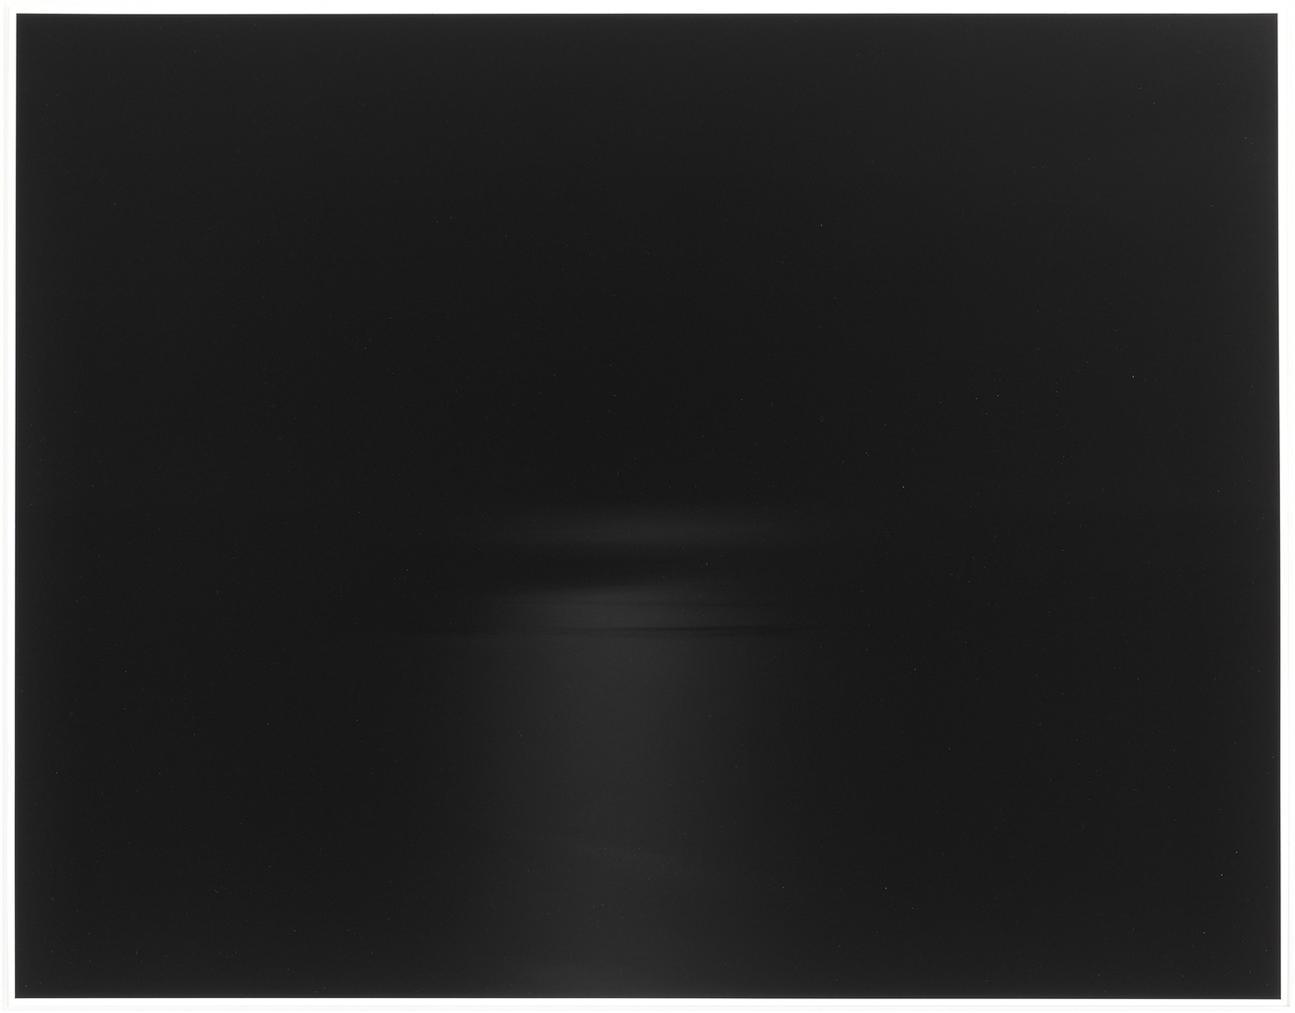 Hiroshi Sugimoto-Ionian Sea Iv, Santa Cesarea (Night)-1993